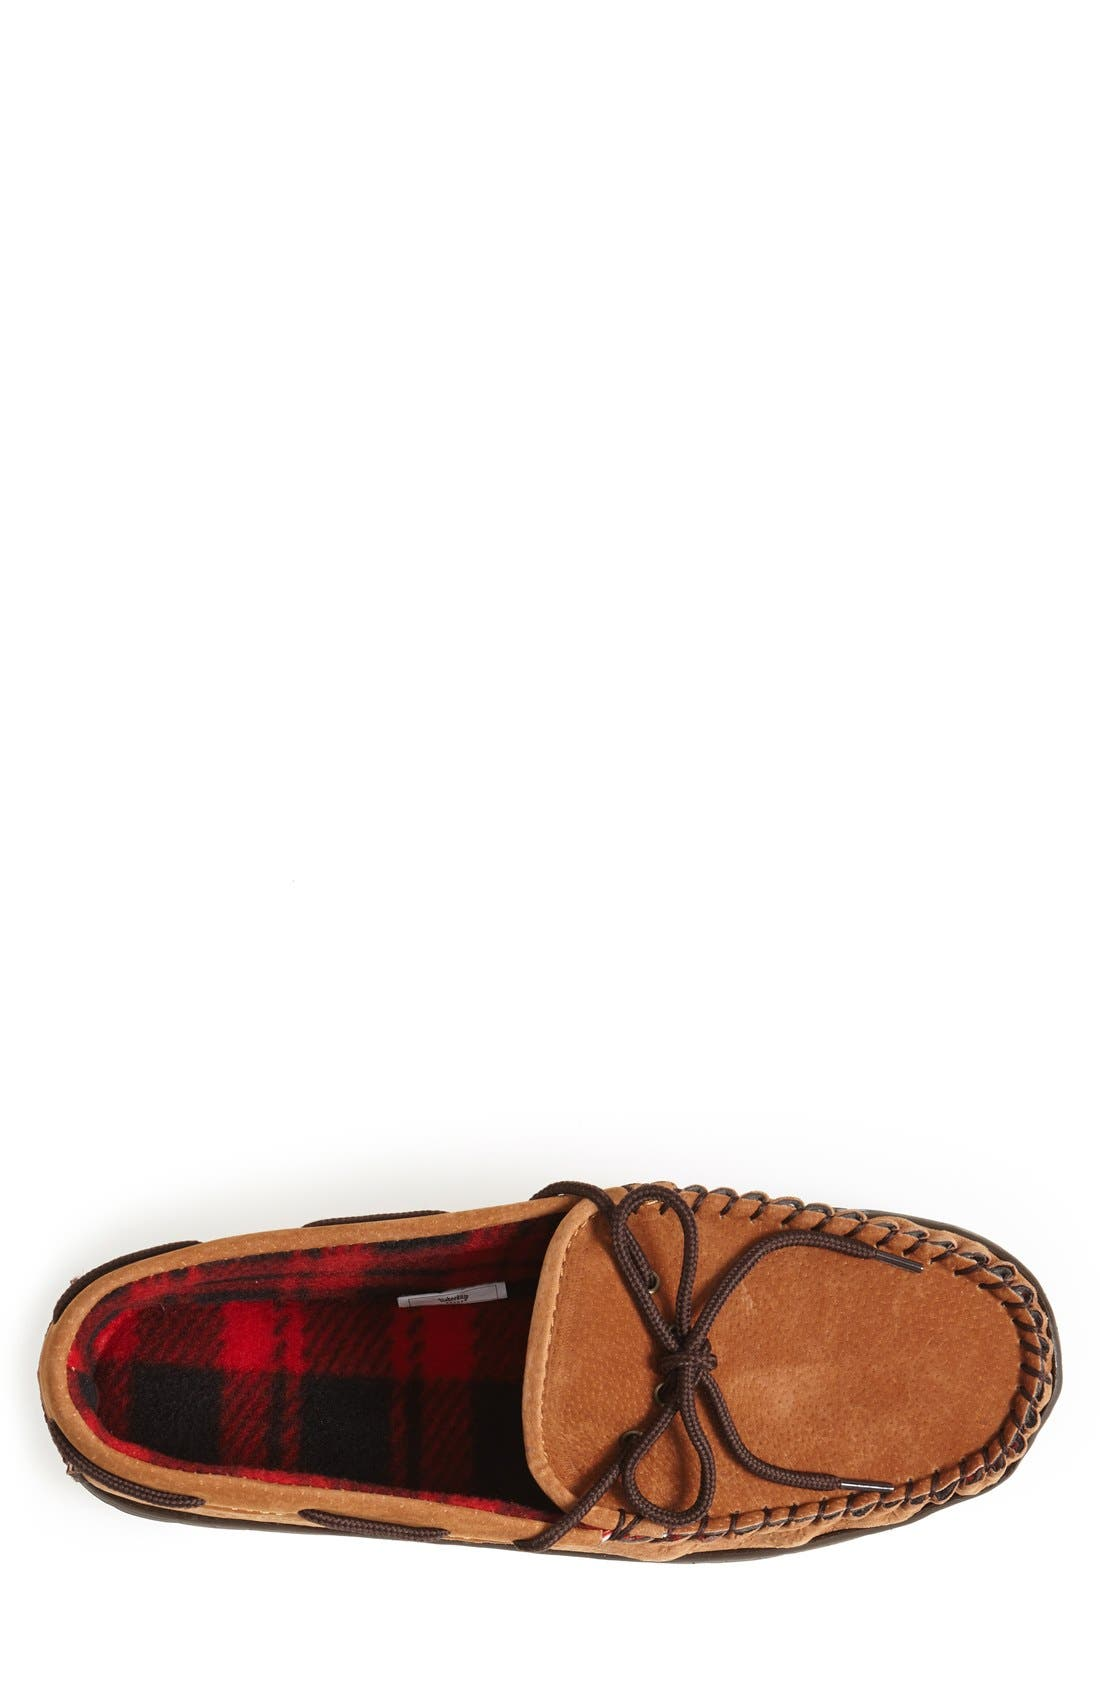 STAHEEKUM Country Flannel Slipper